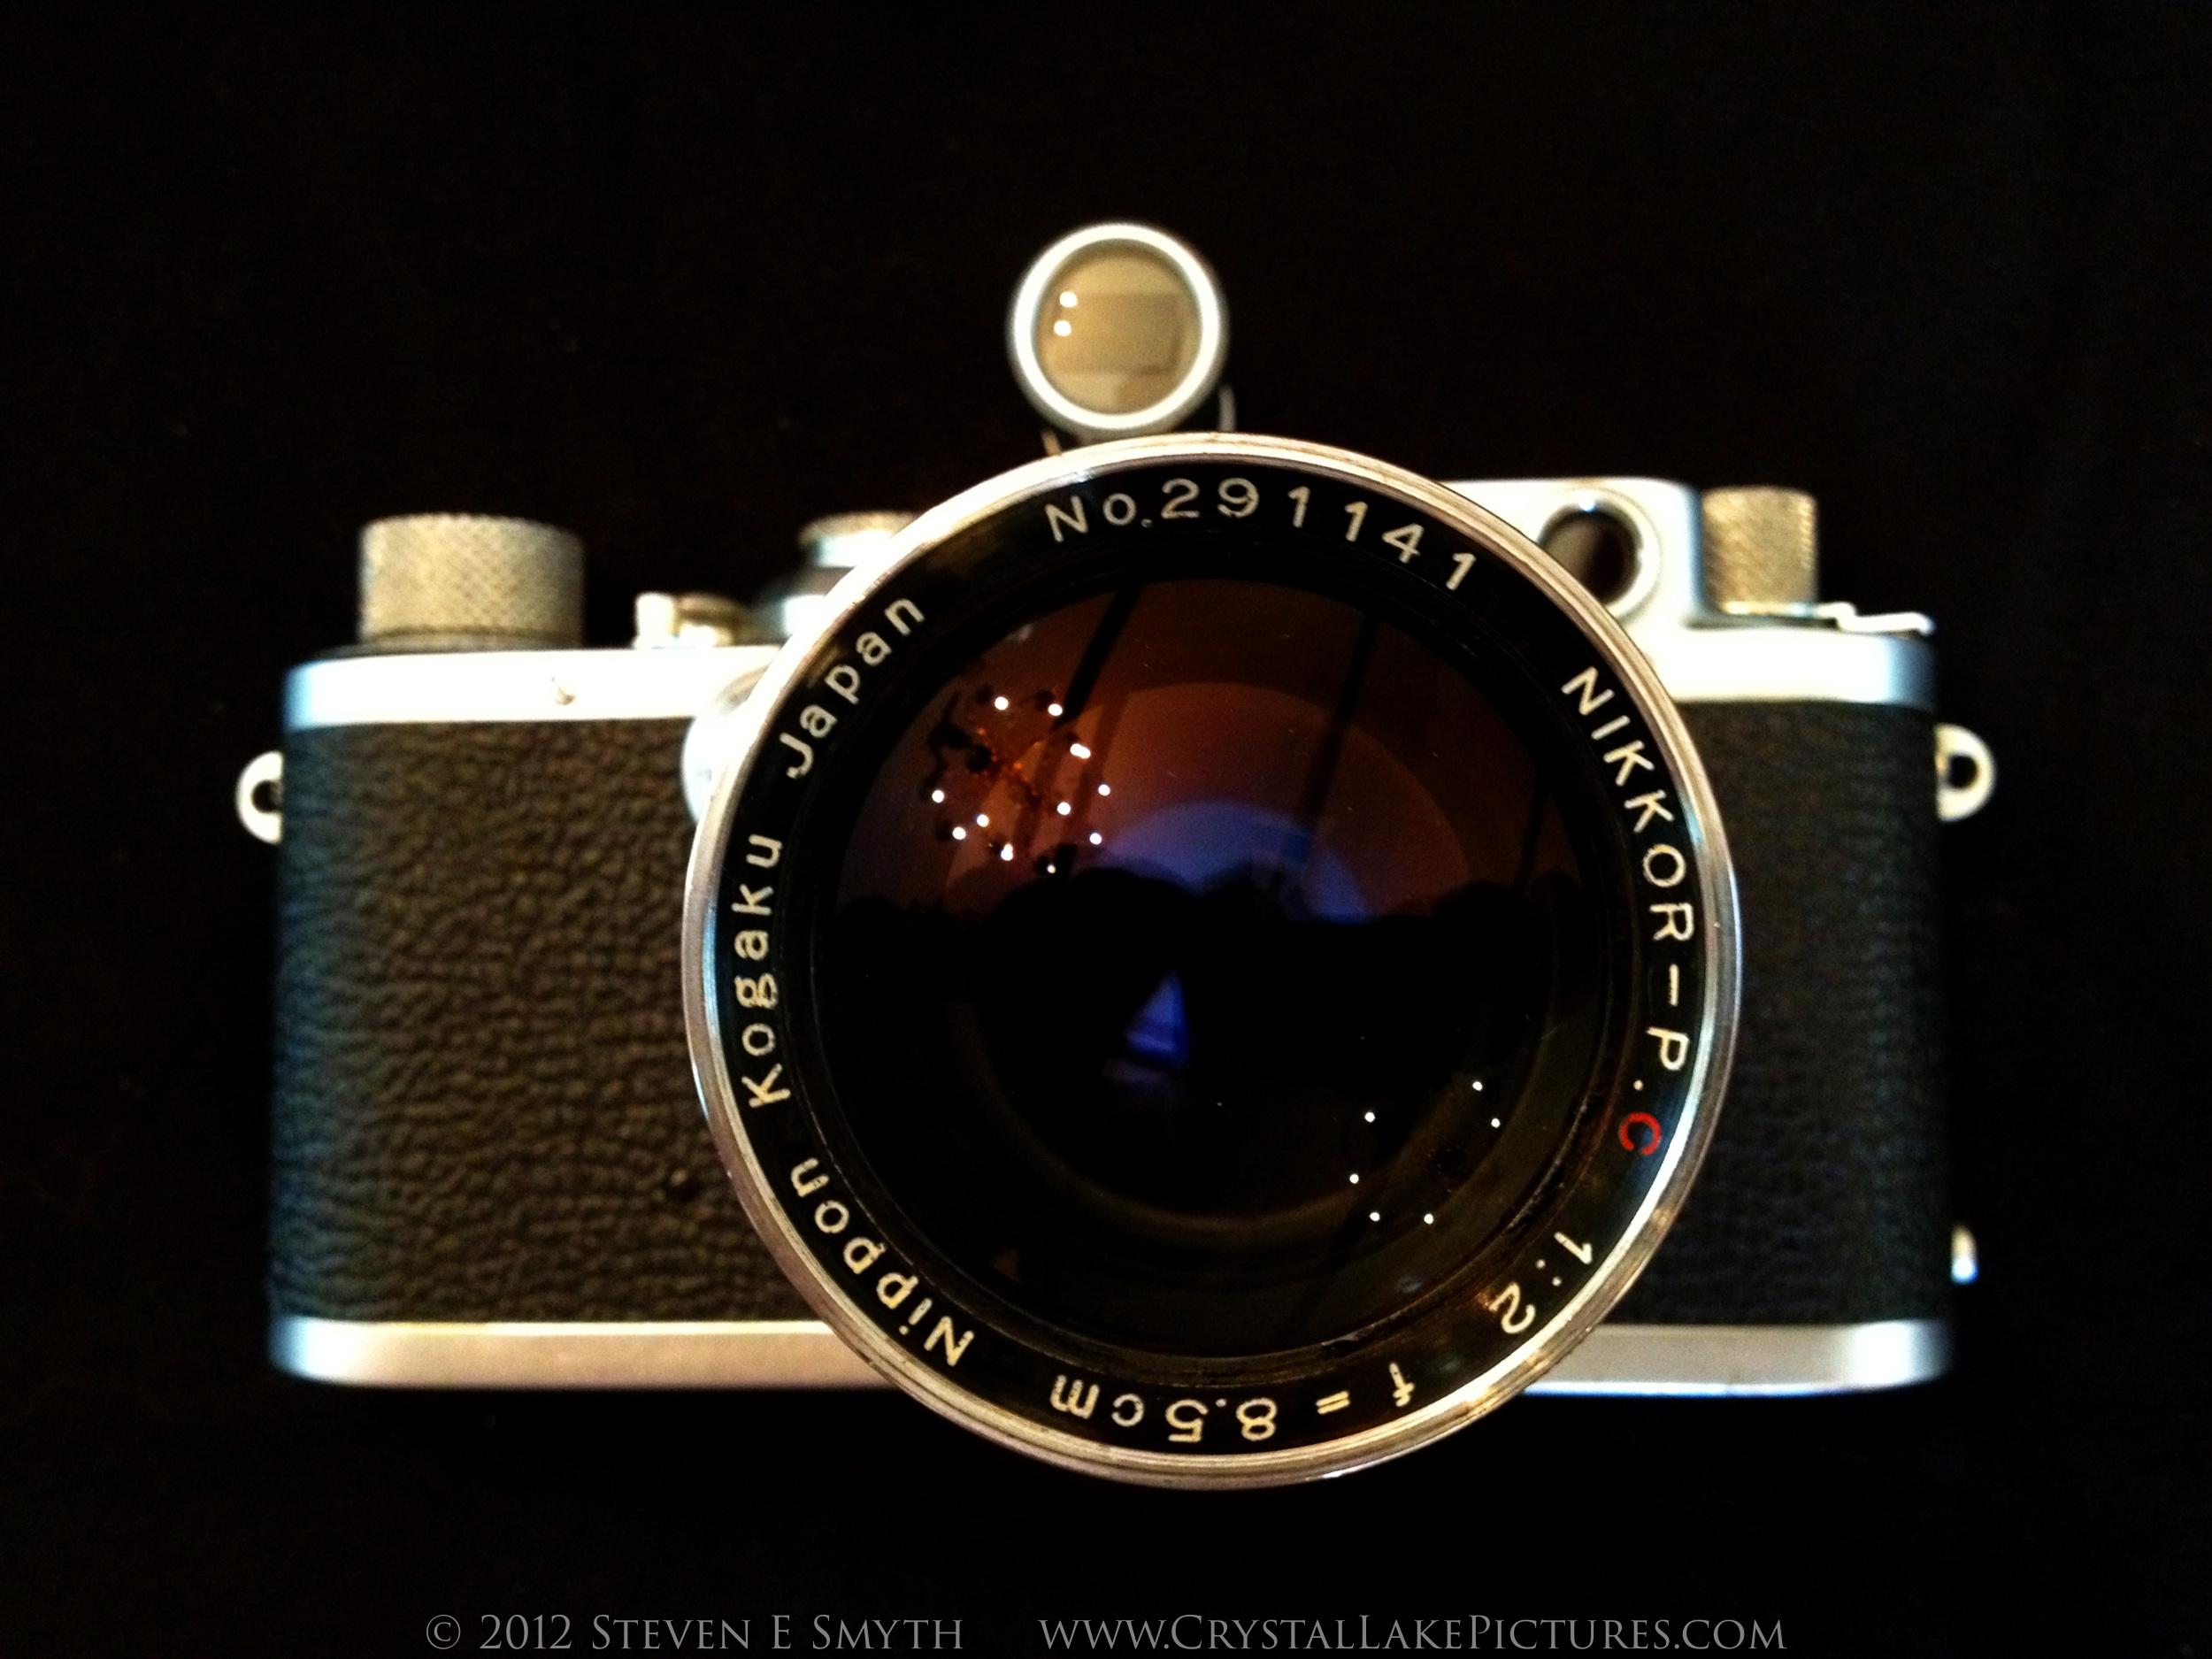 0001_Leica_IMG_3912.jpg